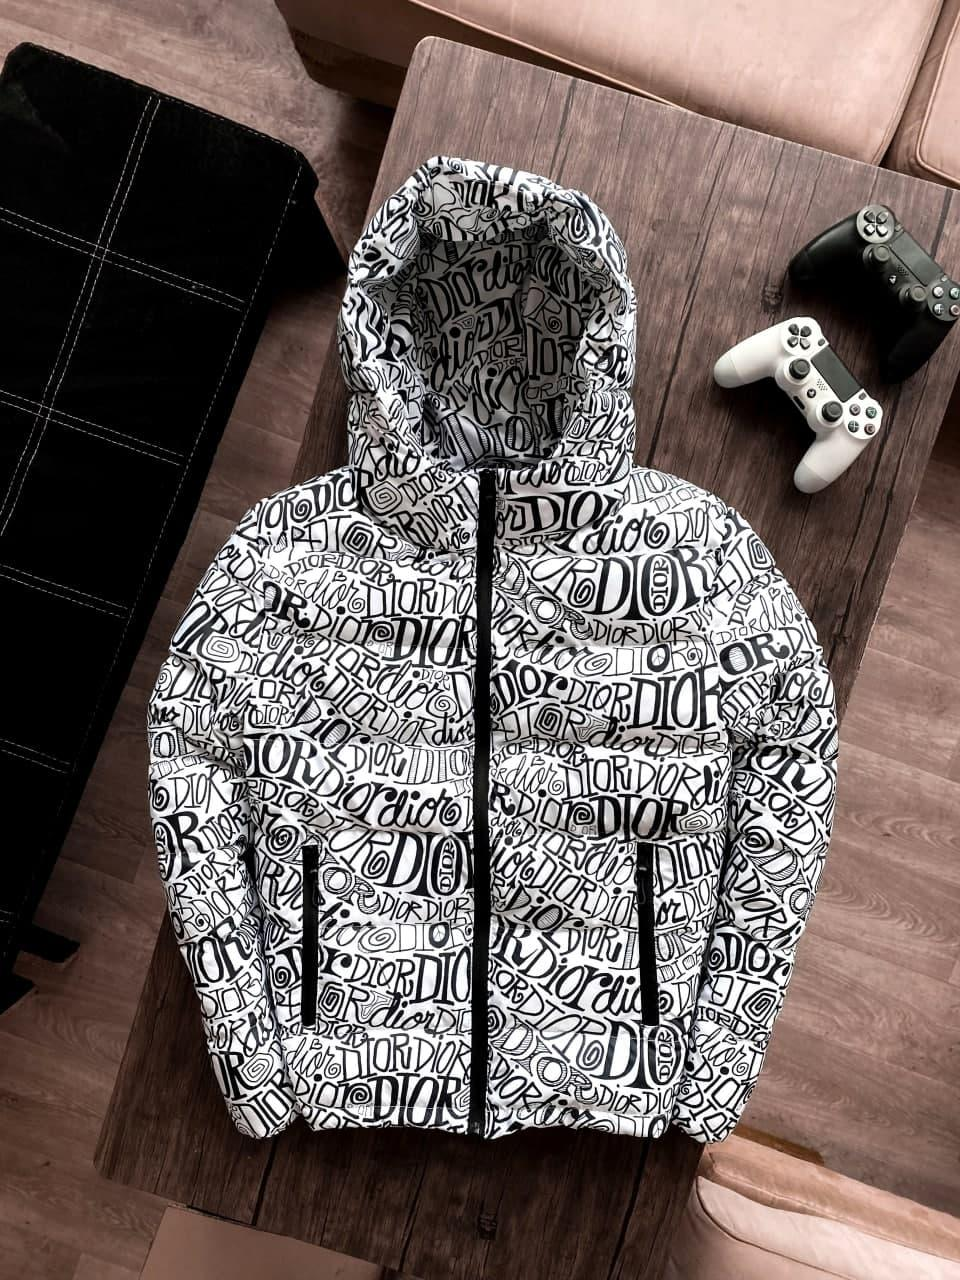 😜 Куртка - Мужская куртка с капюшоном / чоловіча куртка з капюшоном DIOR біла